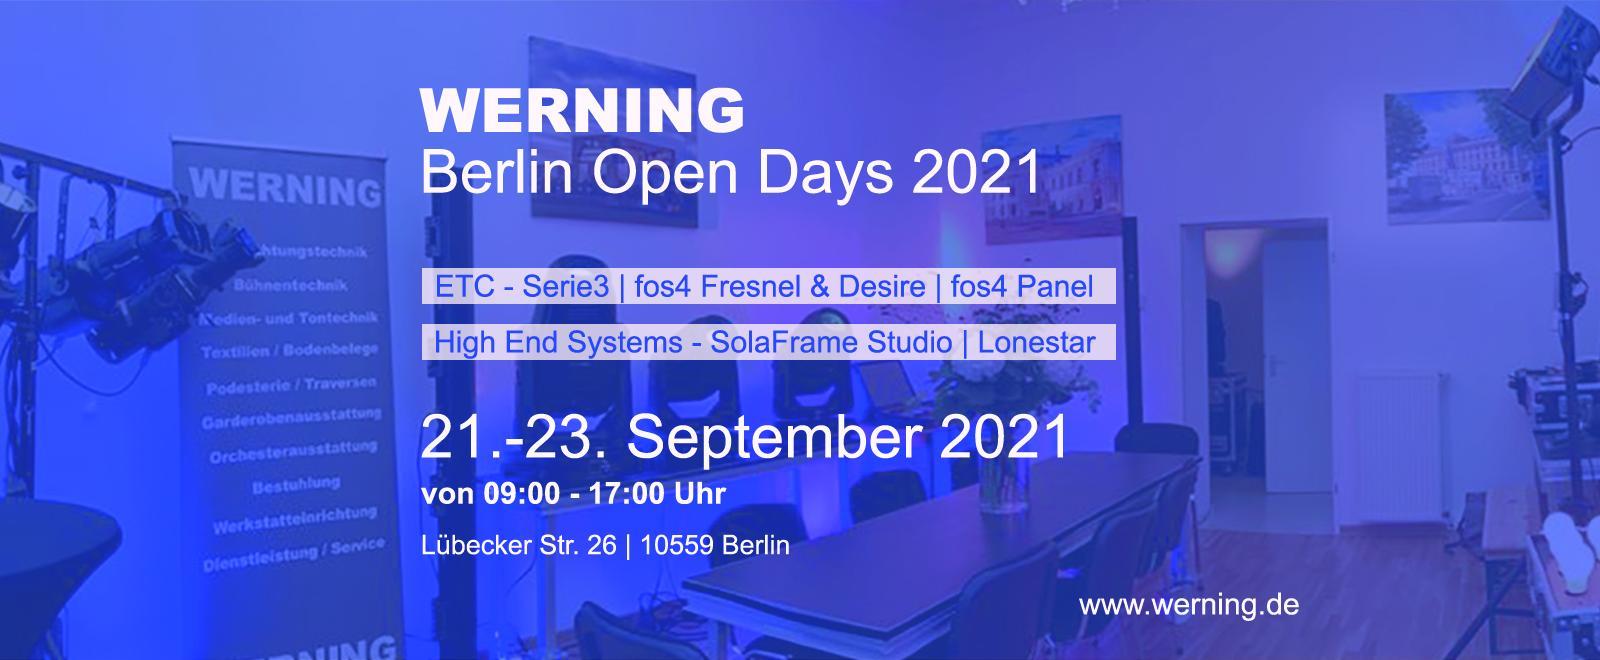 Werning Berlin Open Days 2021